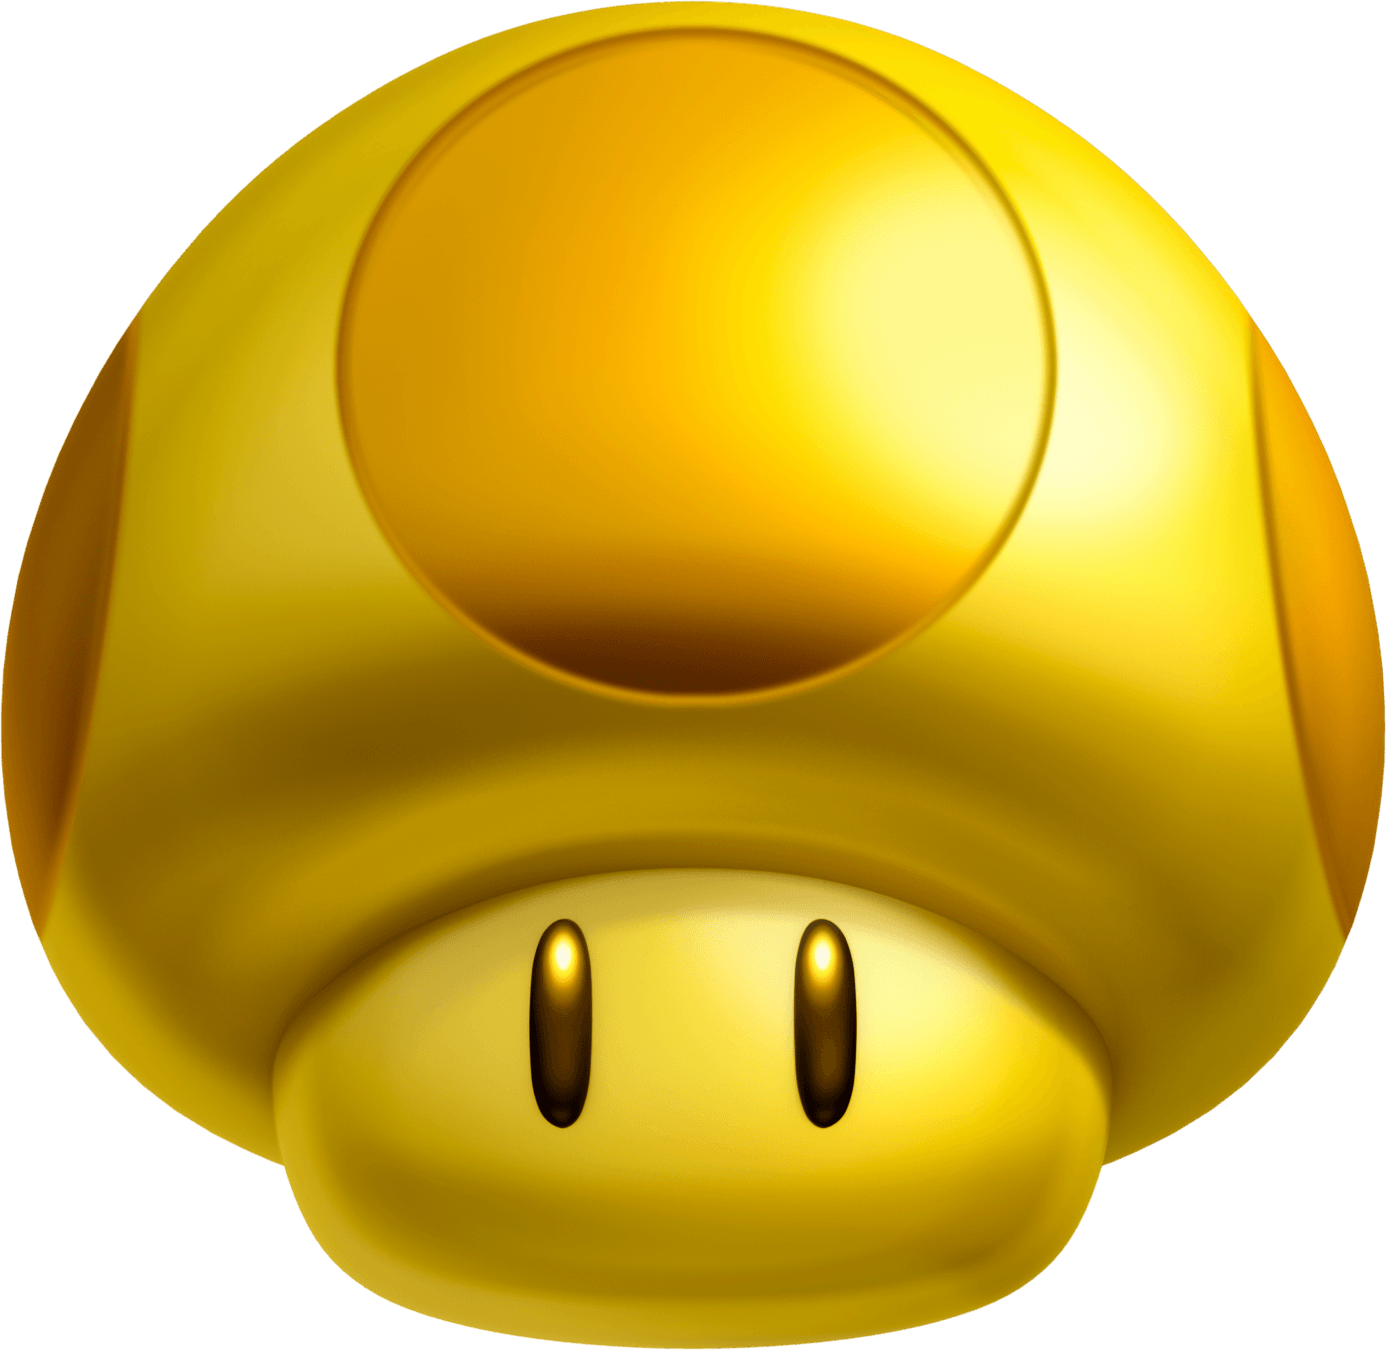 Paper Mario series  Super Mario Wiki the Mario